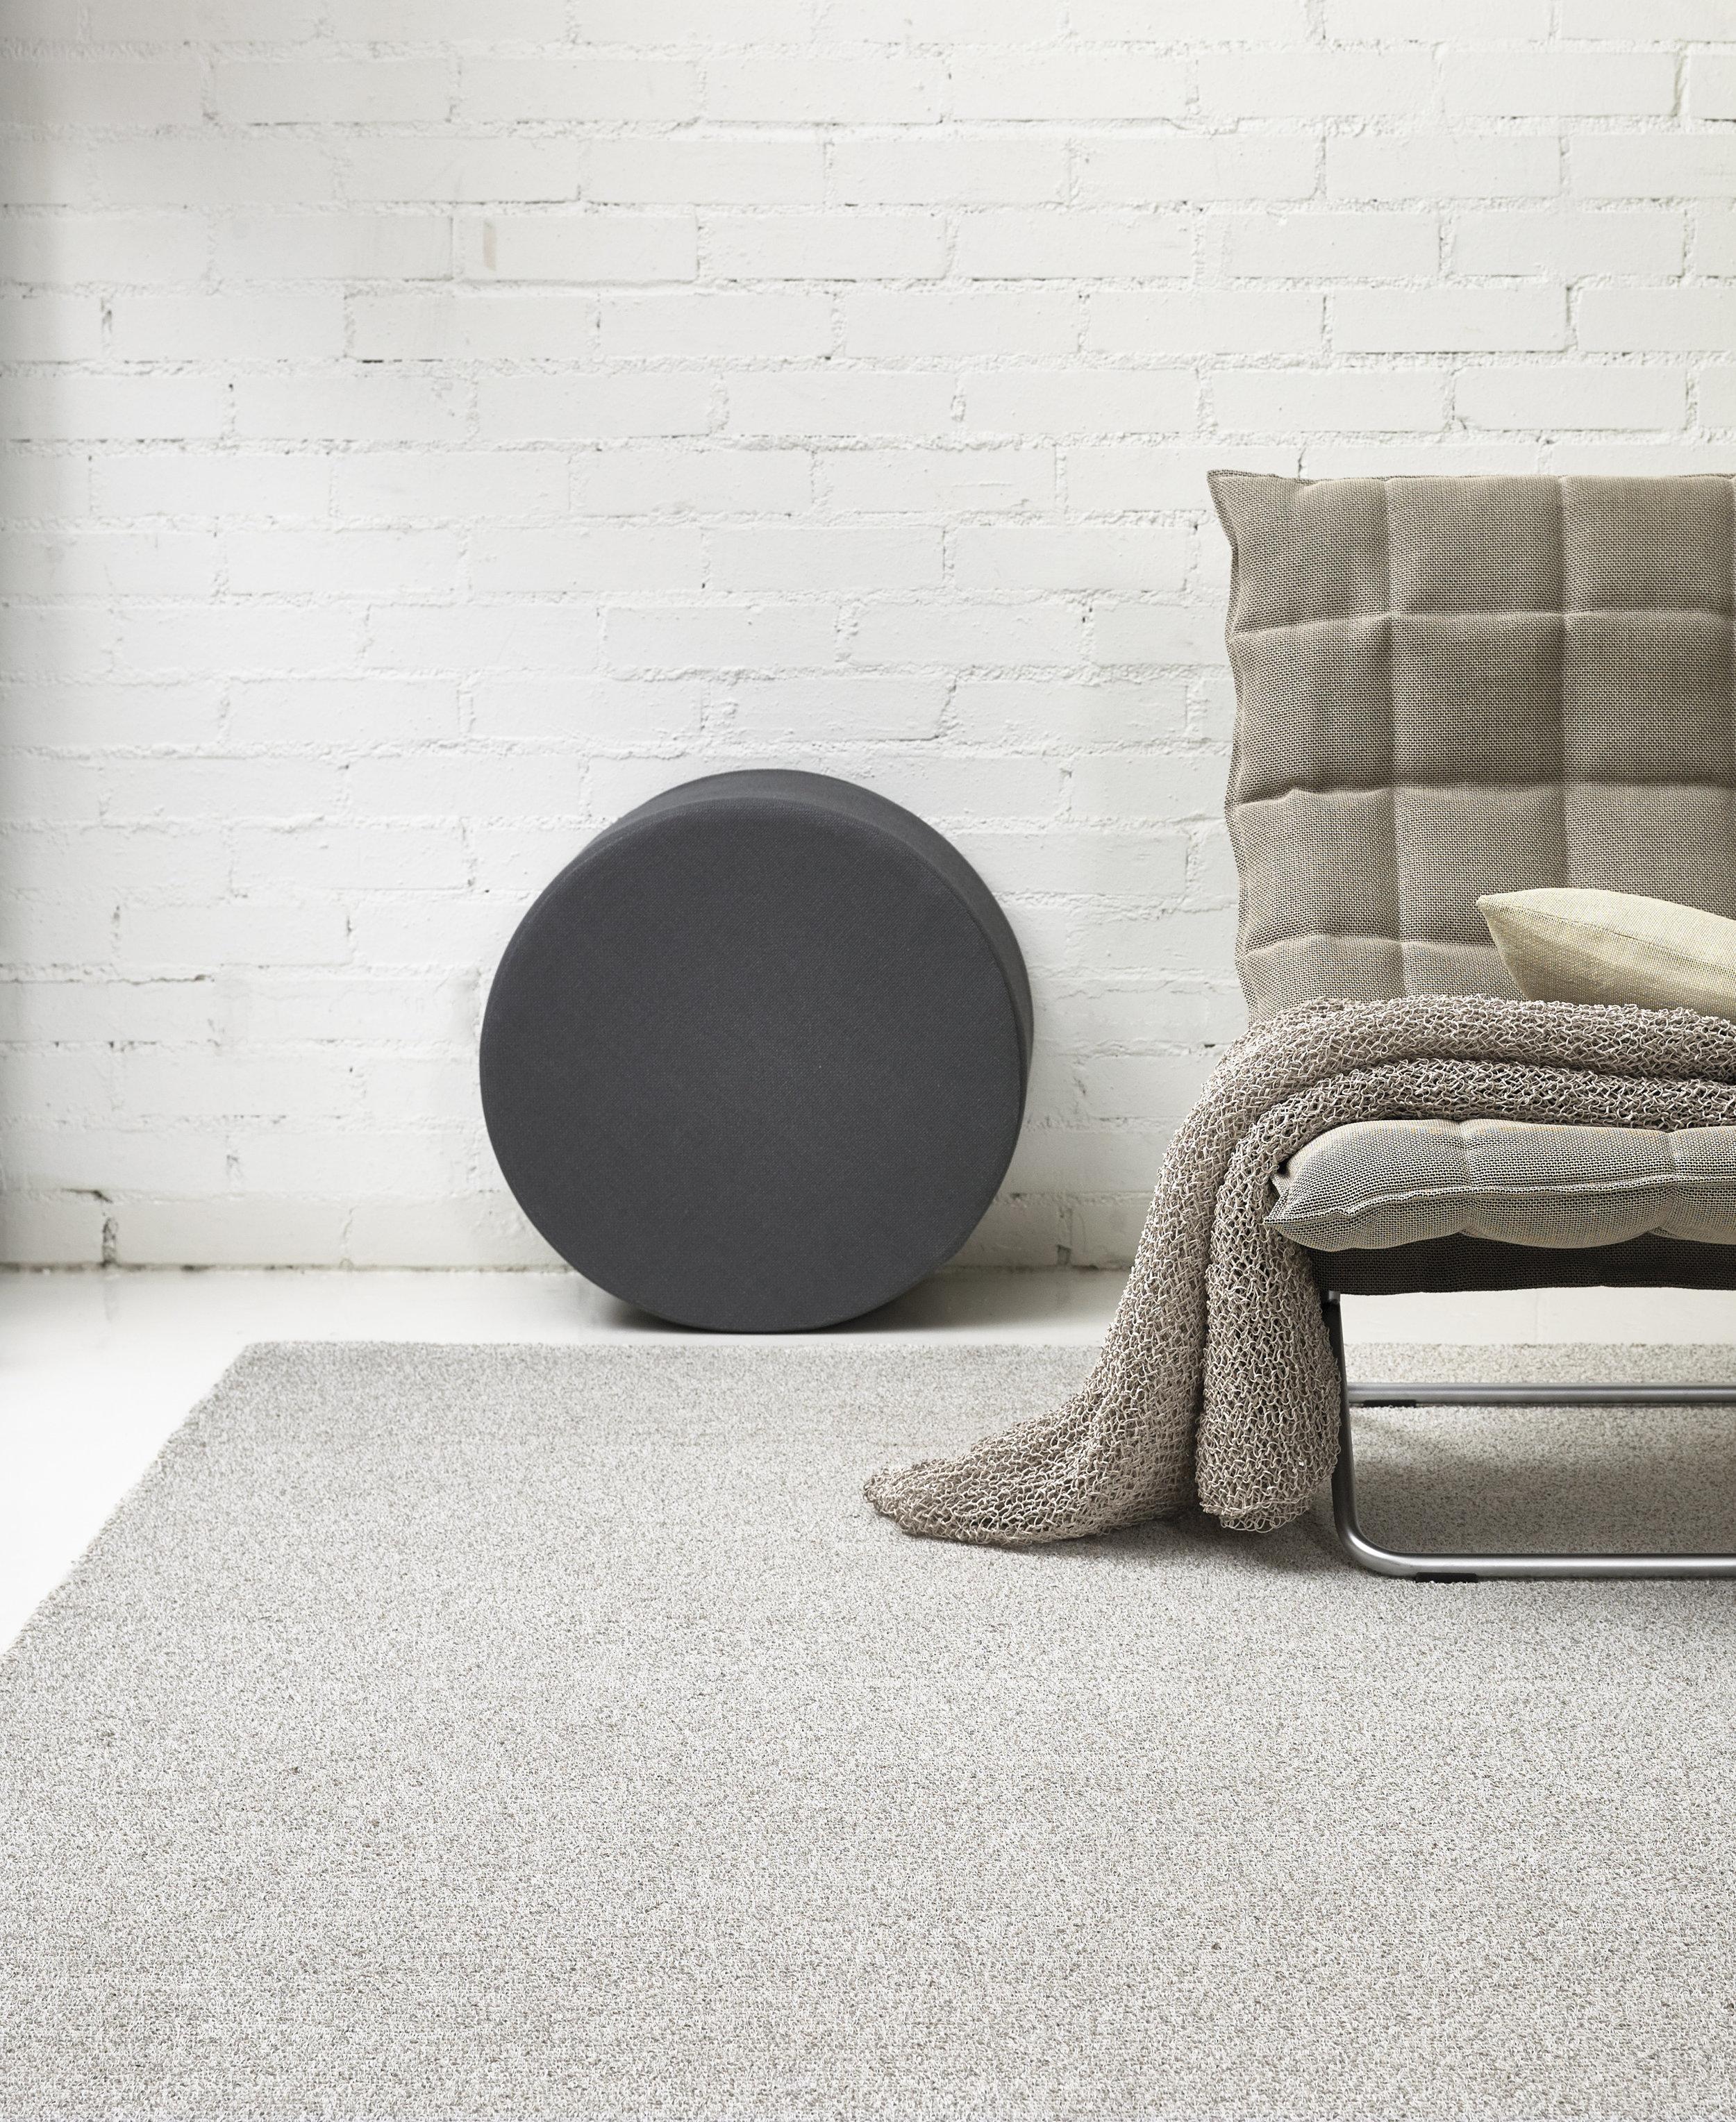 1651501  Tundra  tufted carpet, 436 Round Cool cushion, 46003 Narrow k Chair, 47215 Seaborn stone throw